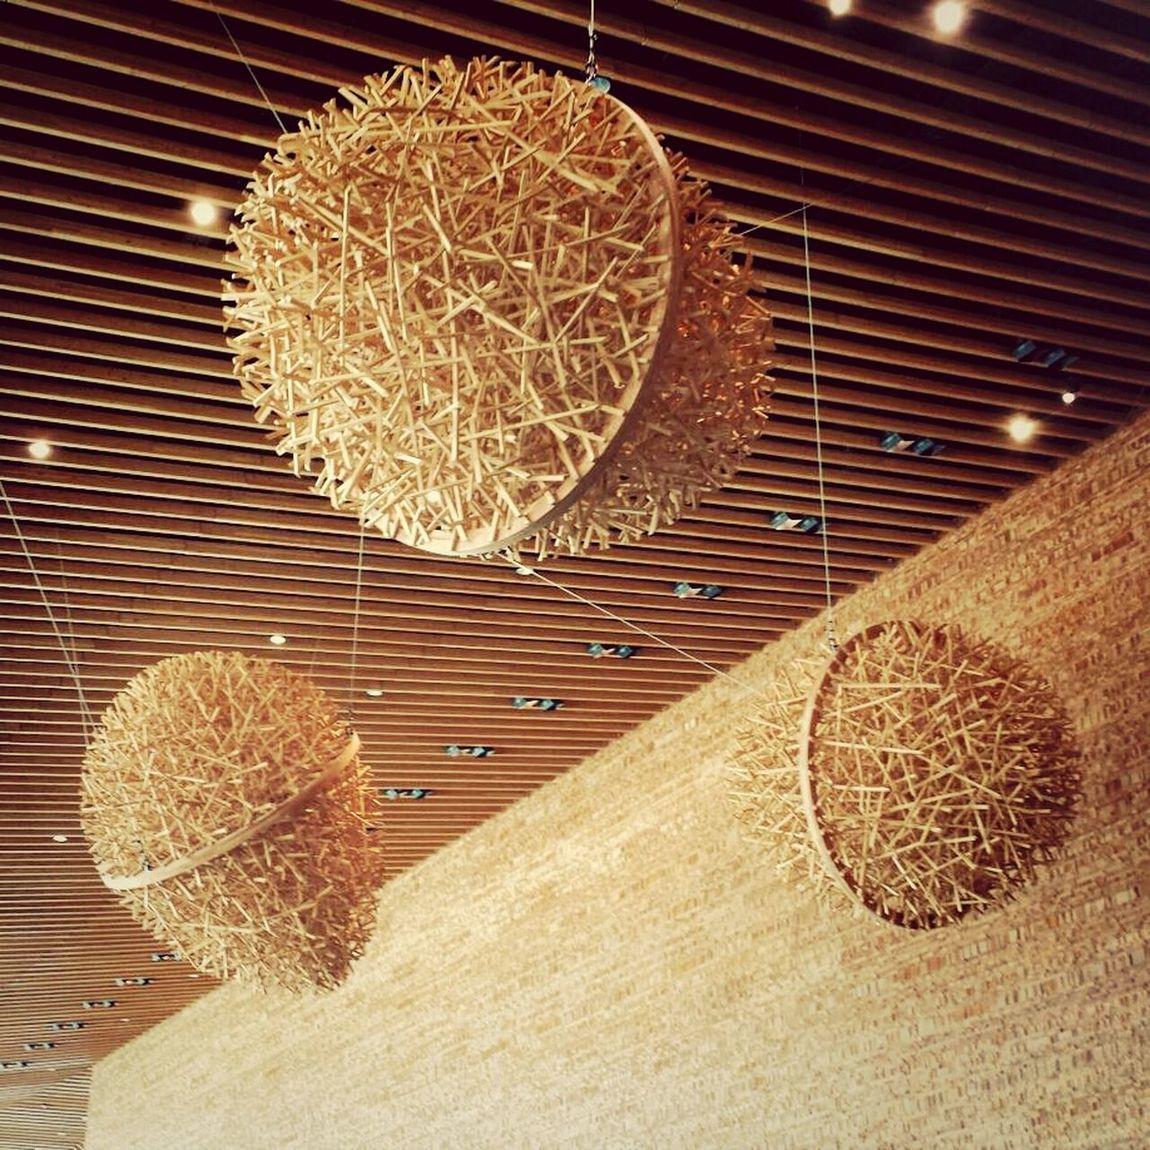 Balls of wood